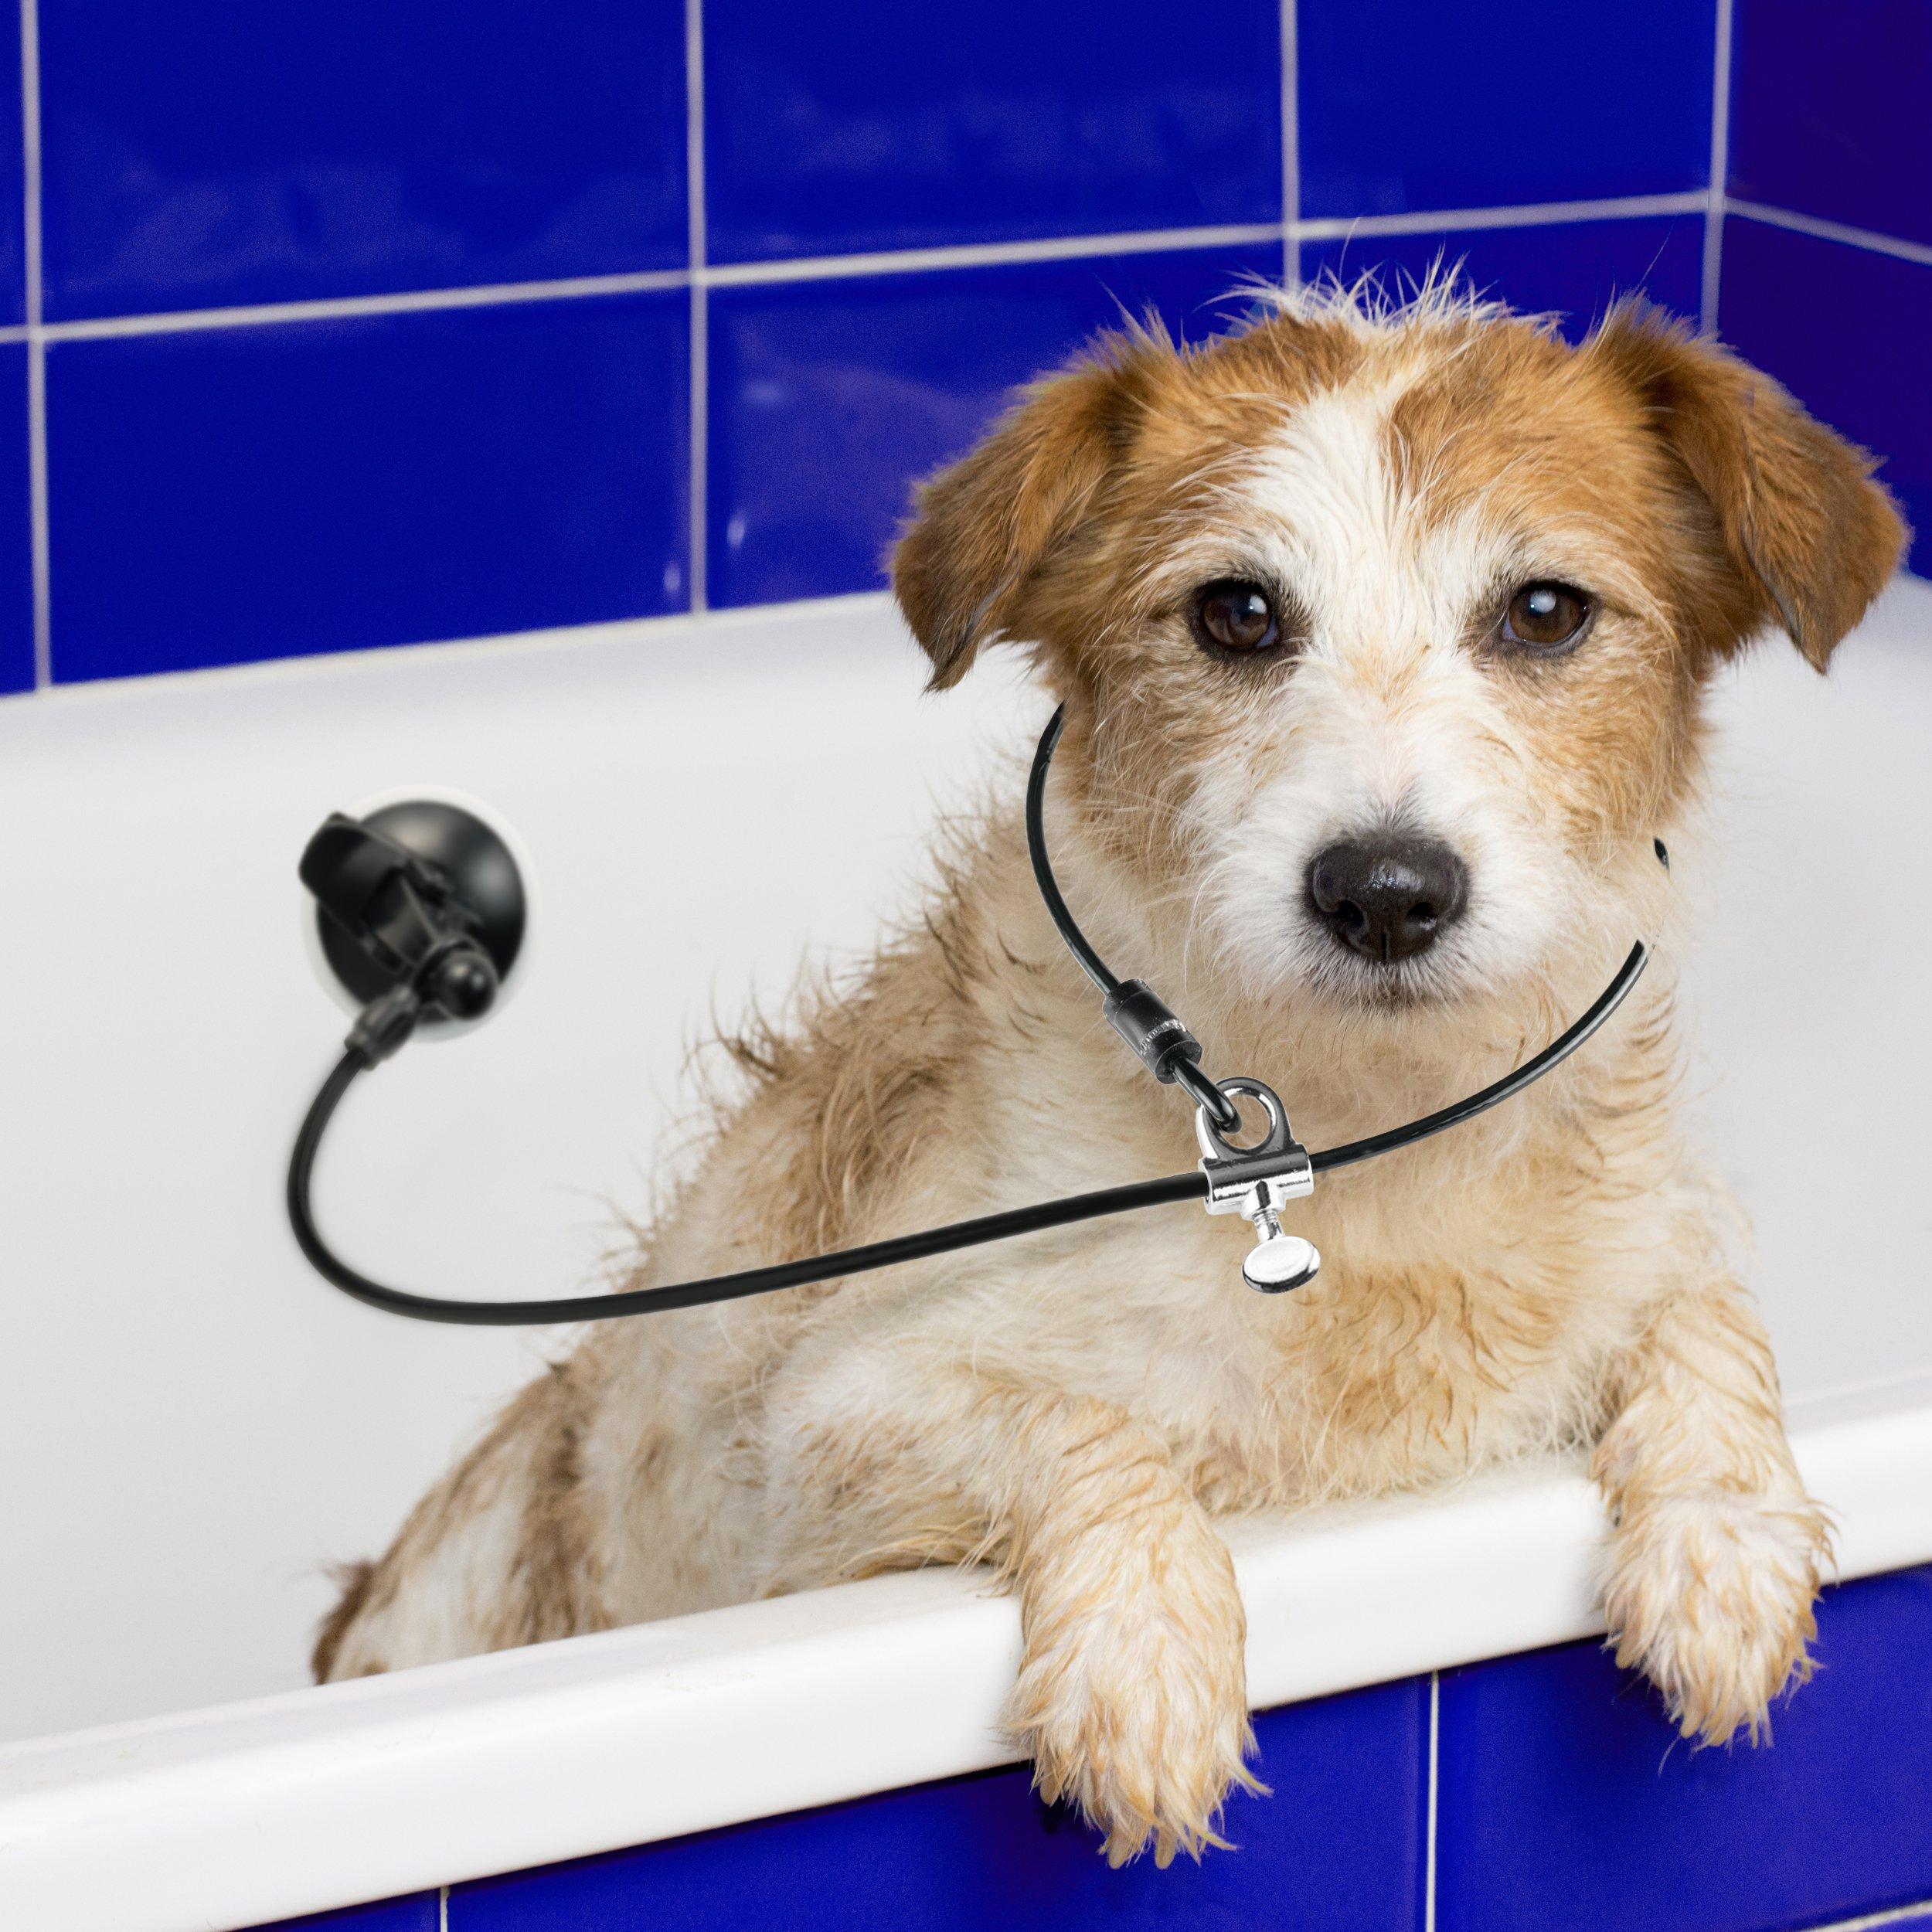 Last Leash Dog Bathing Restraint